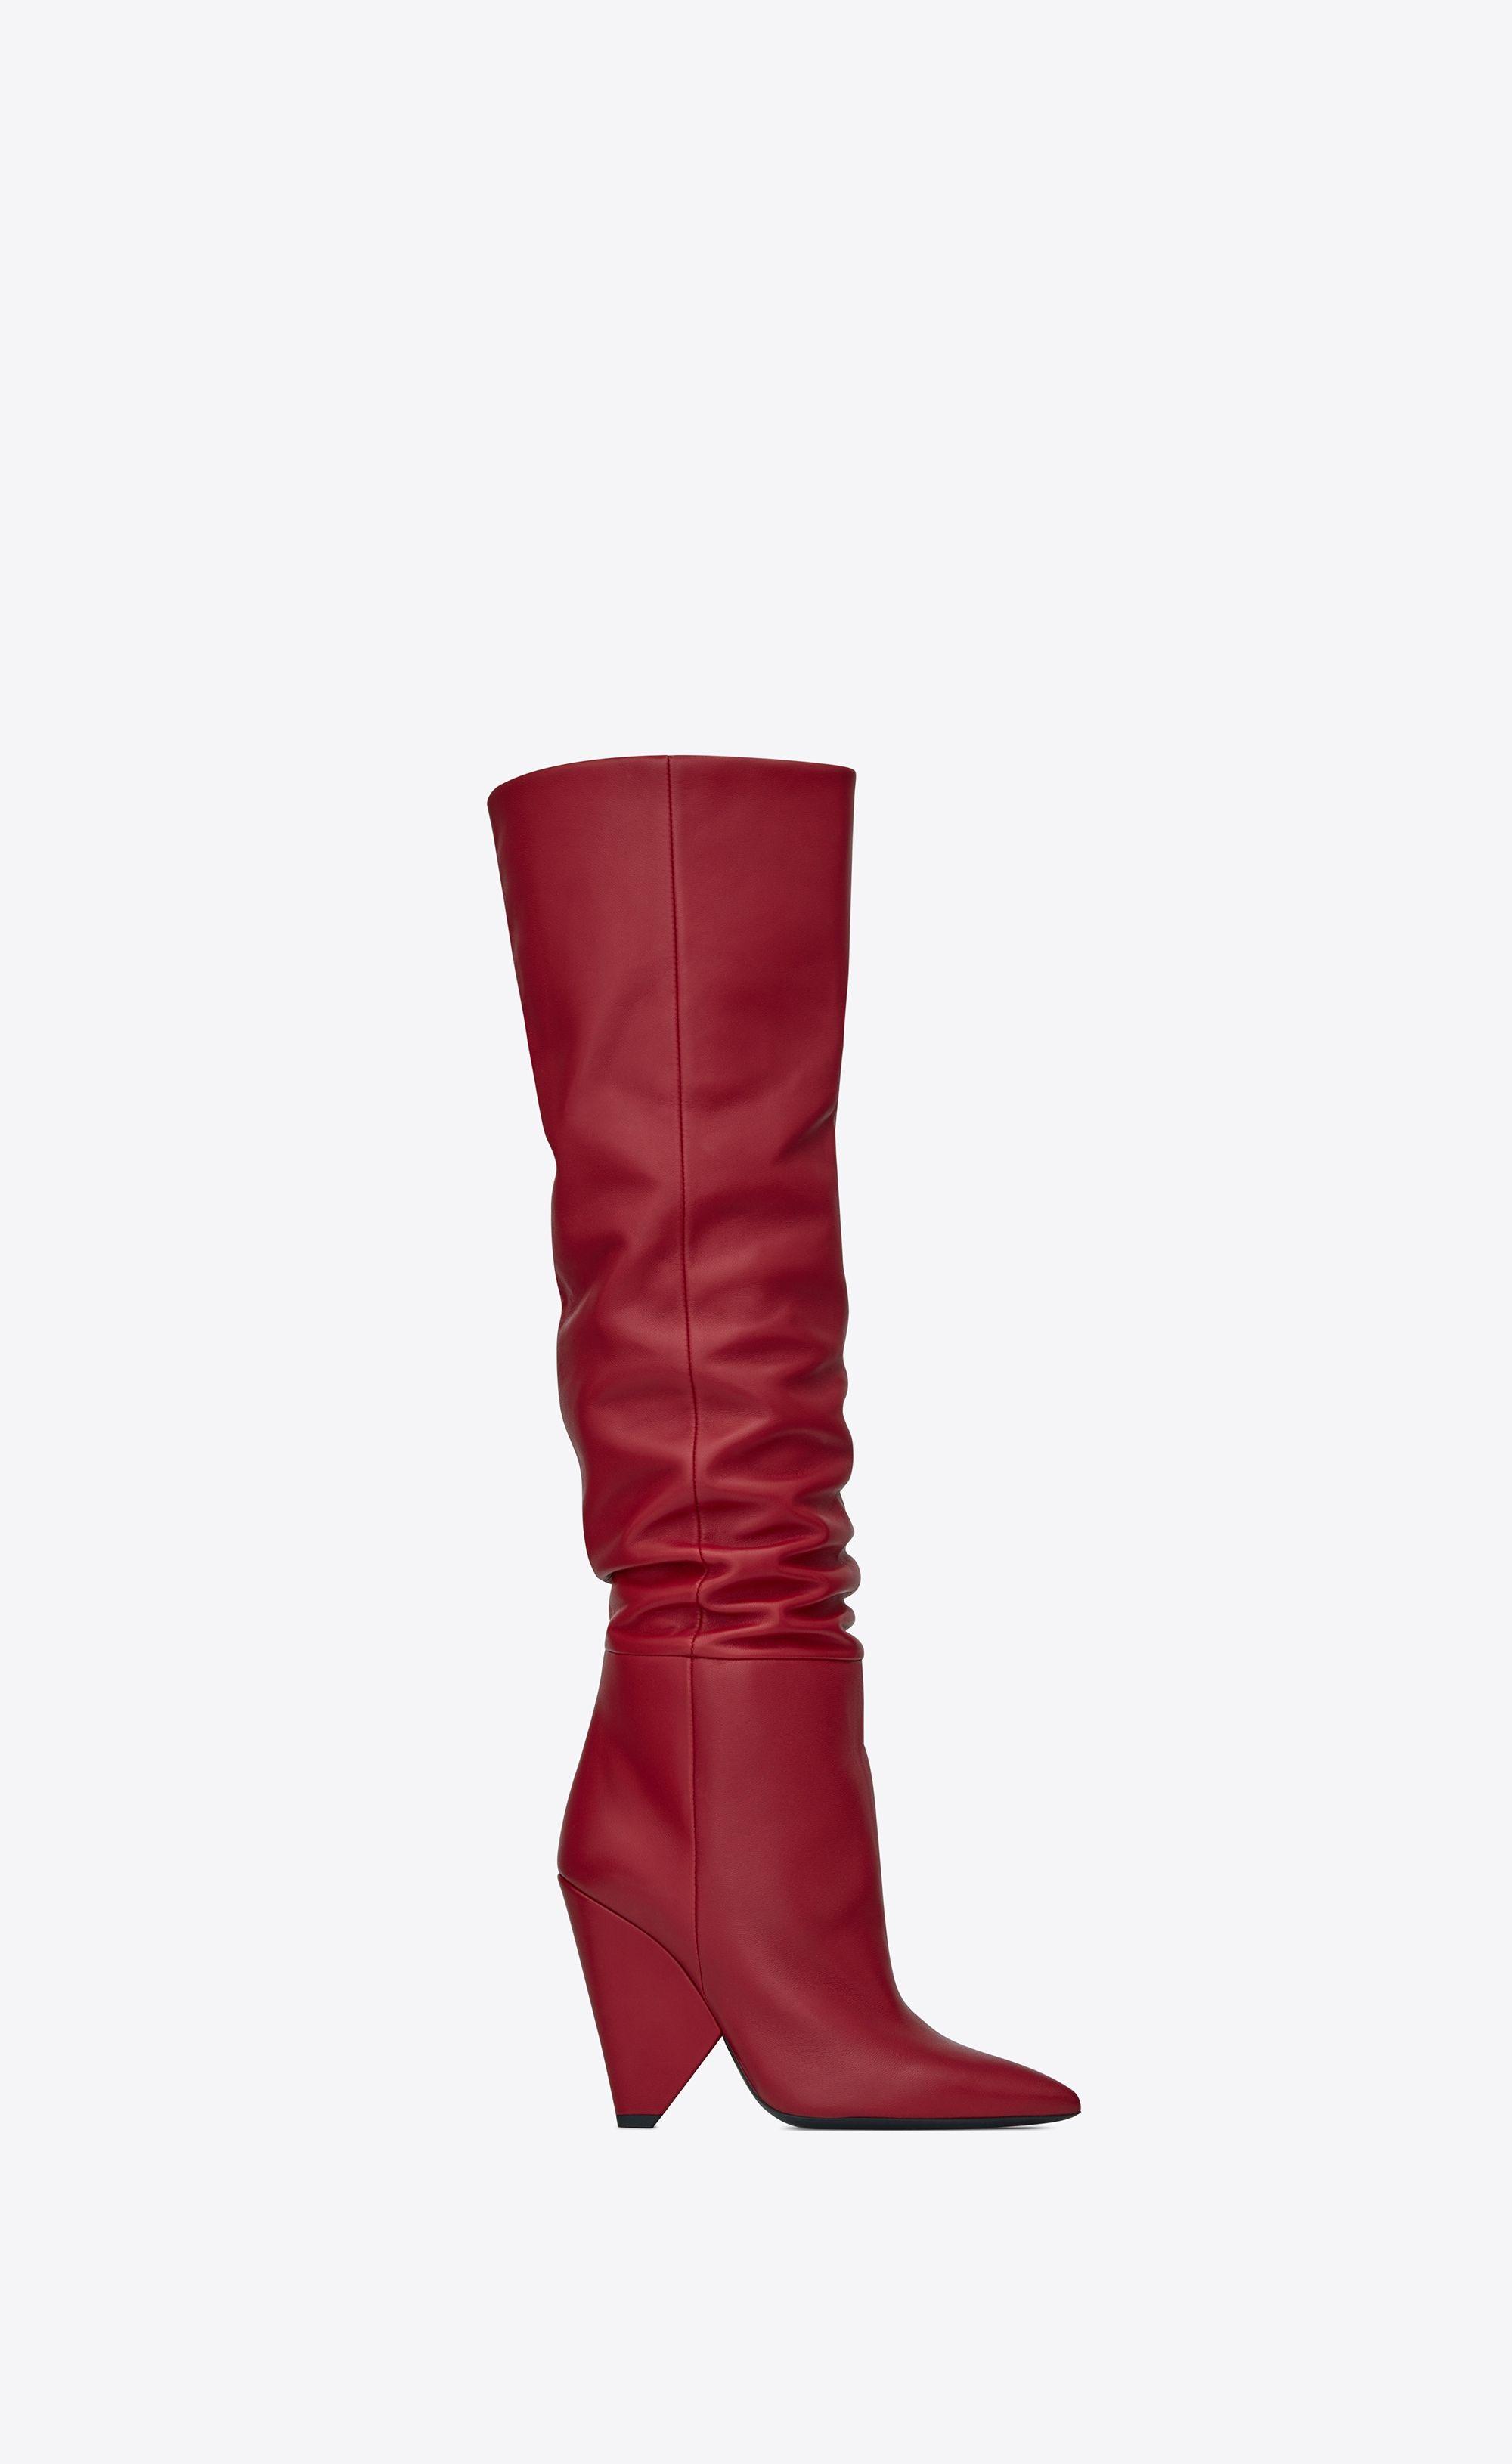 9897067add5 Saint Laurent Niki Wedge Boot In Lambskin   YSL.com   c o m b y n e ...